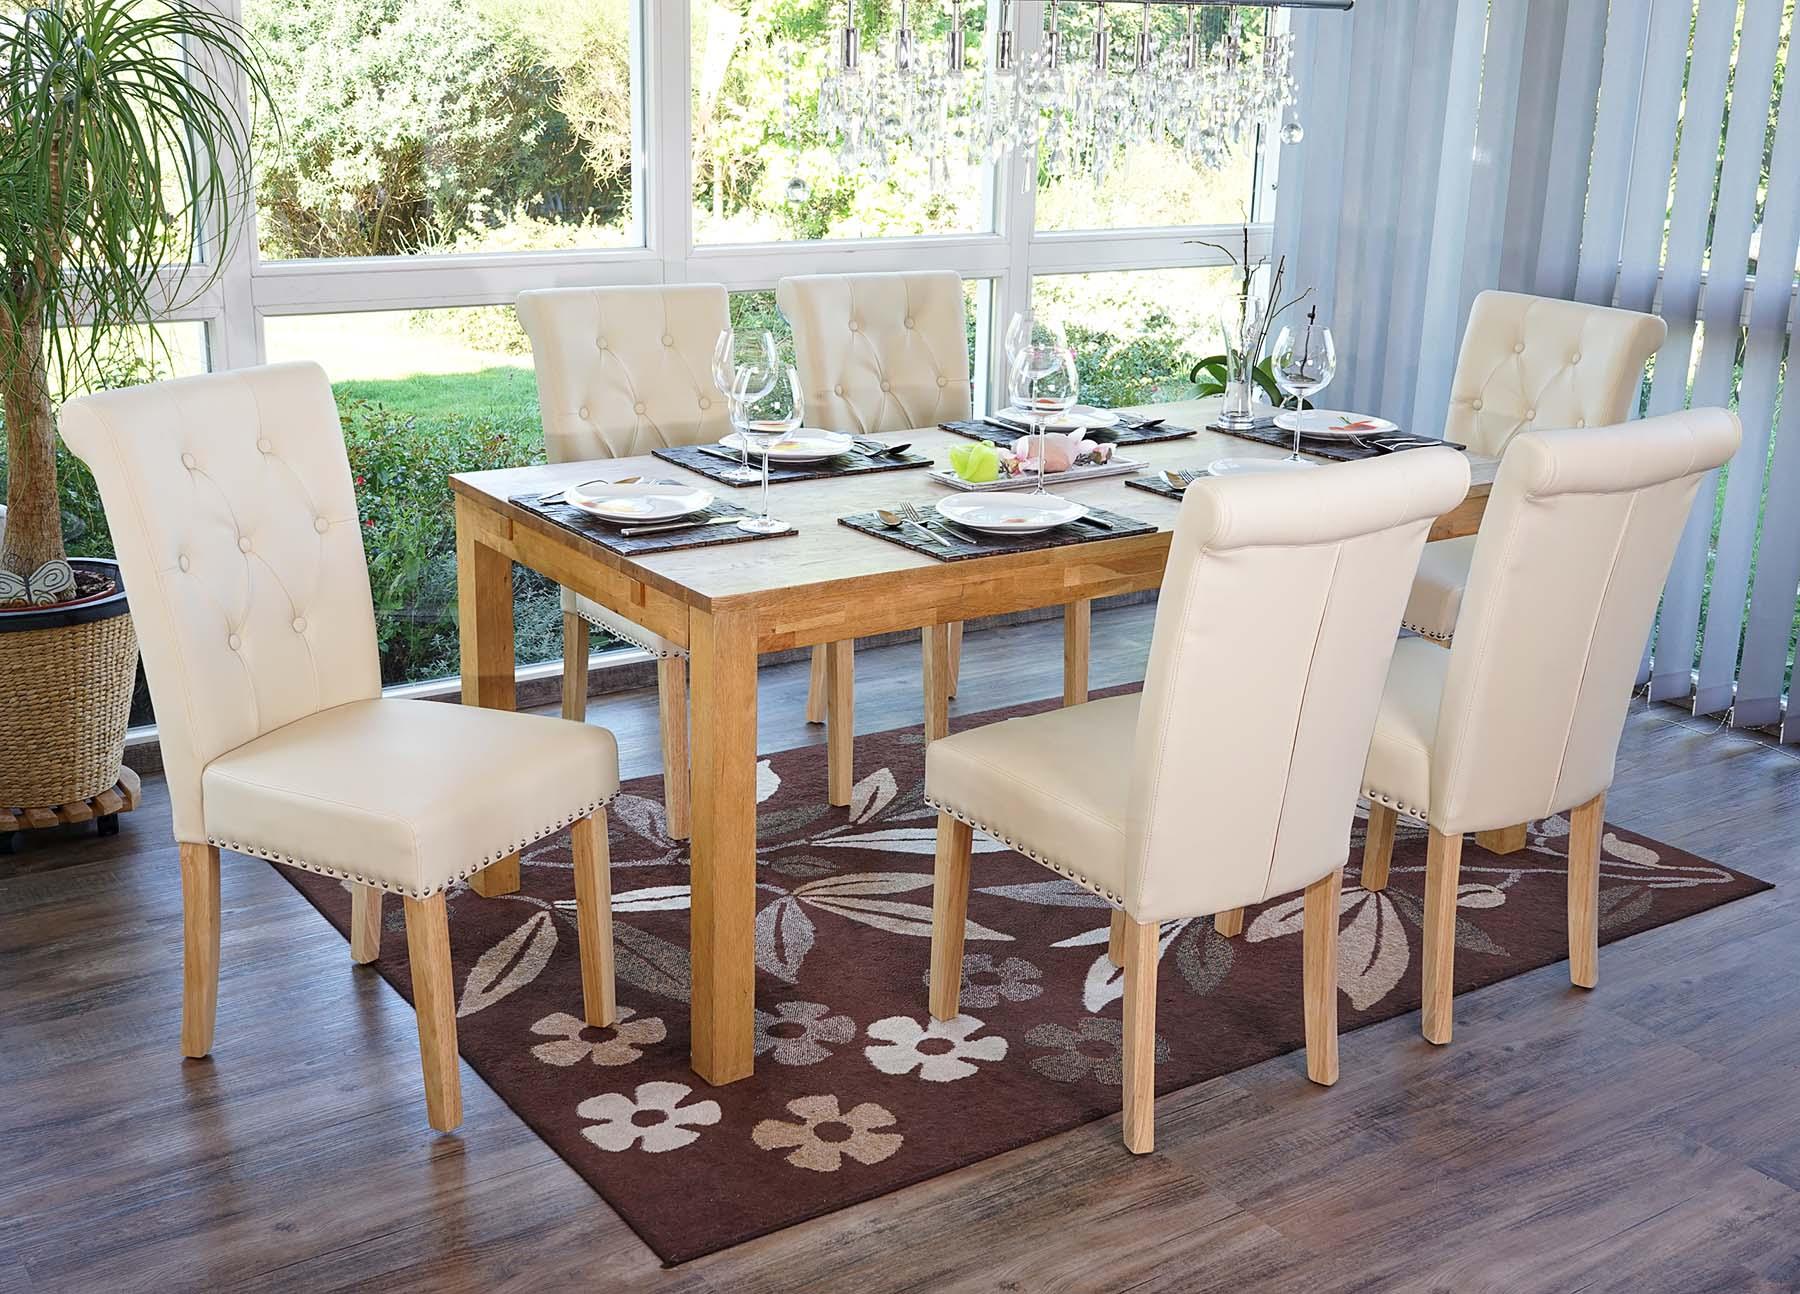 6x esszimmerstuhl chesterfield ii stuhl lehnstuhl mit nieten kunstleder ebay. Black Bedroom Furniture Sets. Home Design Ideas